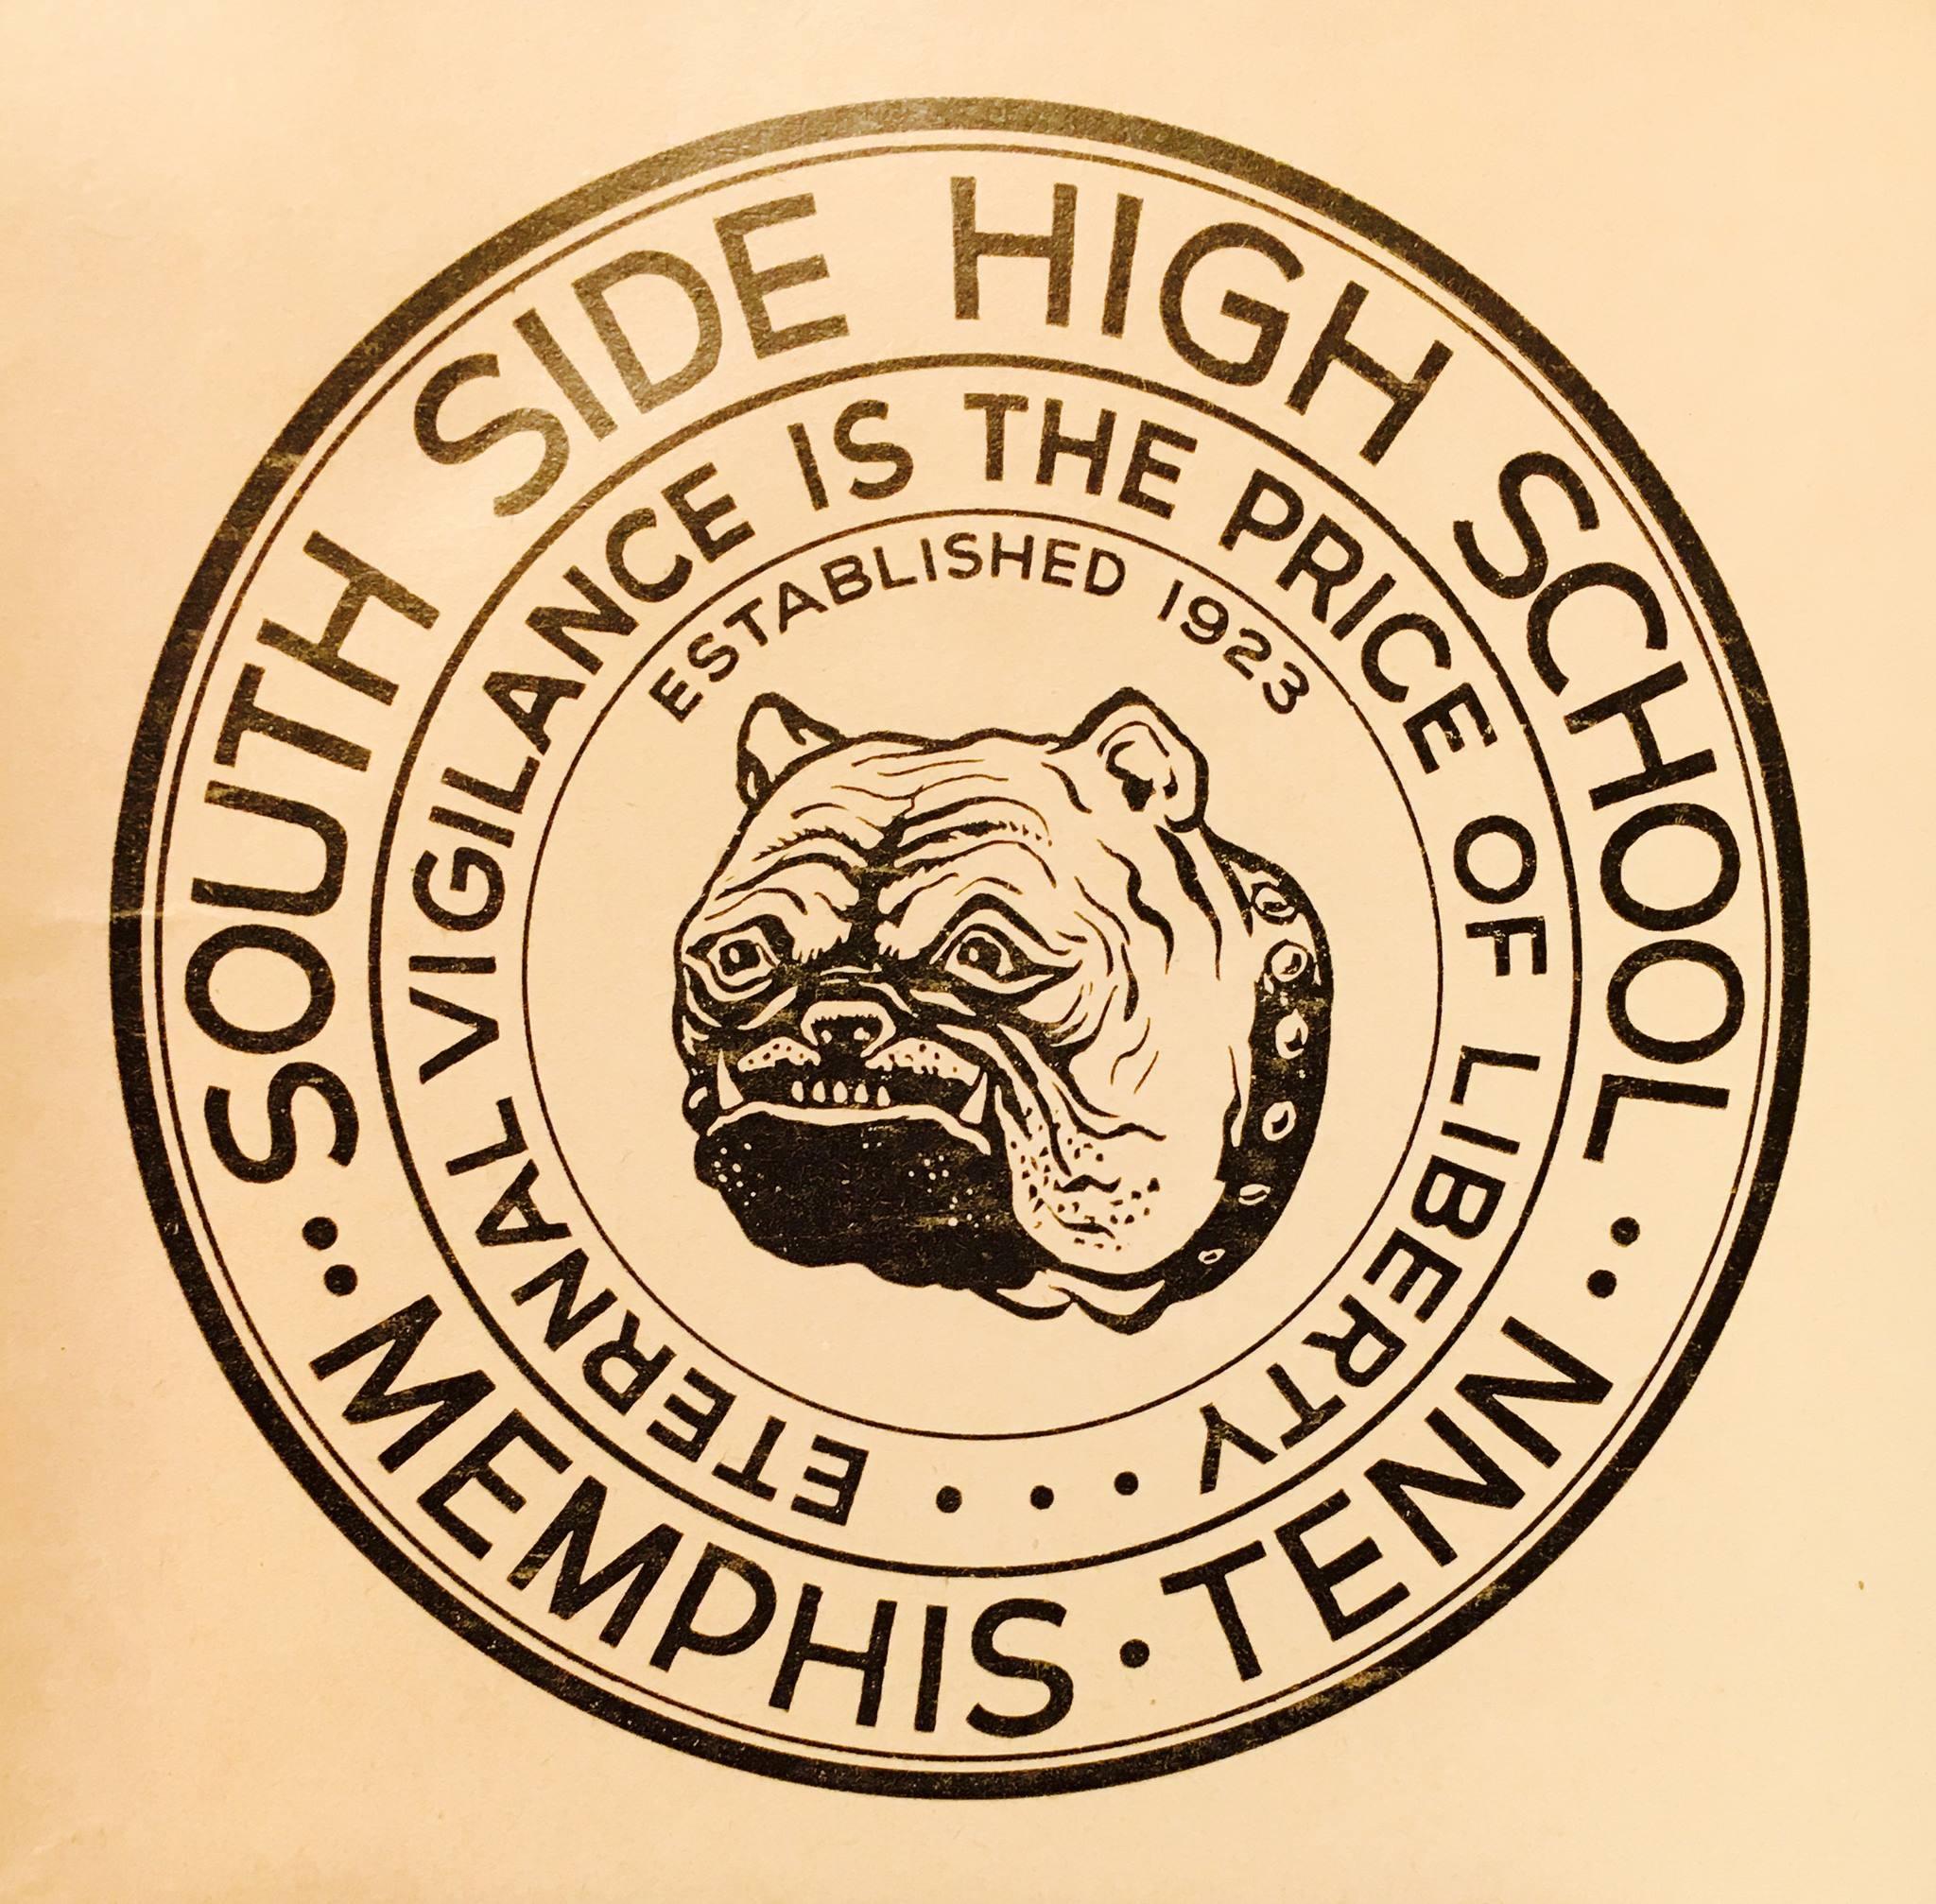 SSHS Seal